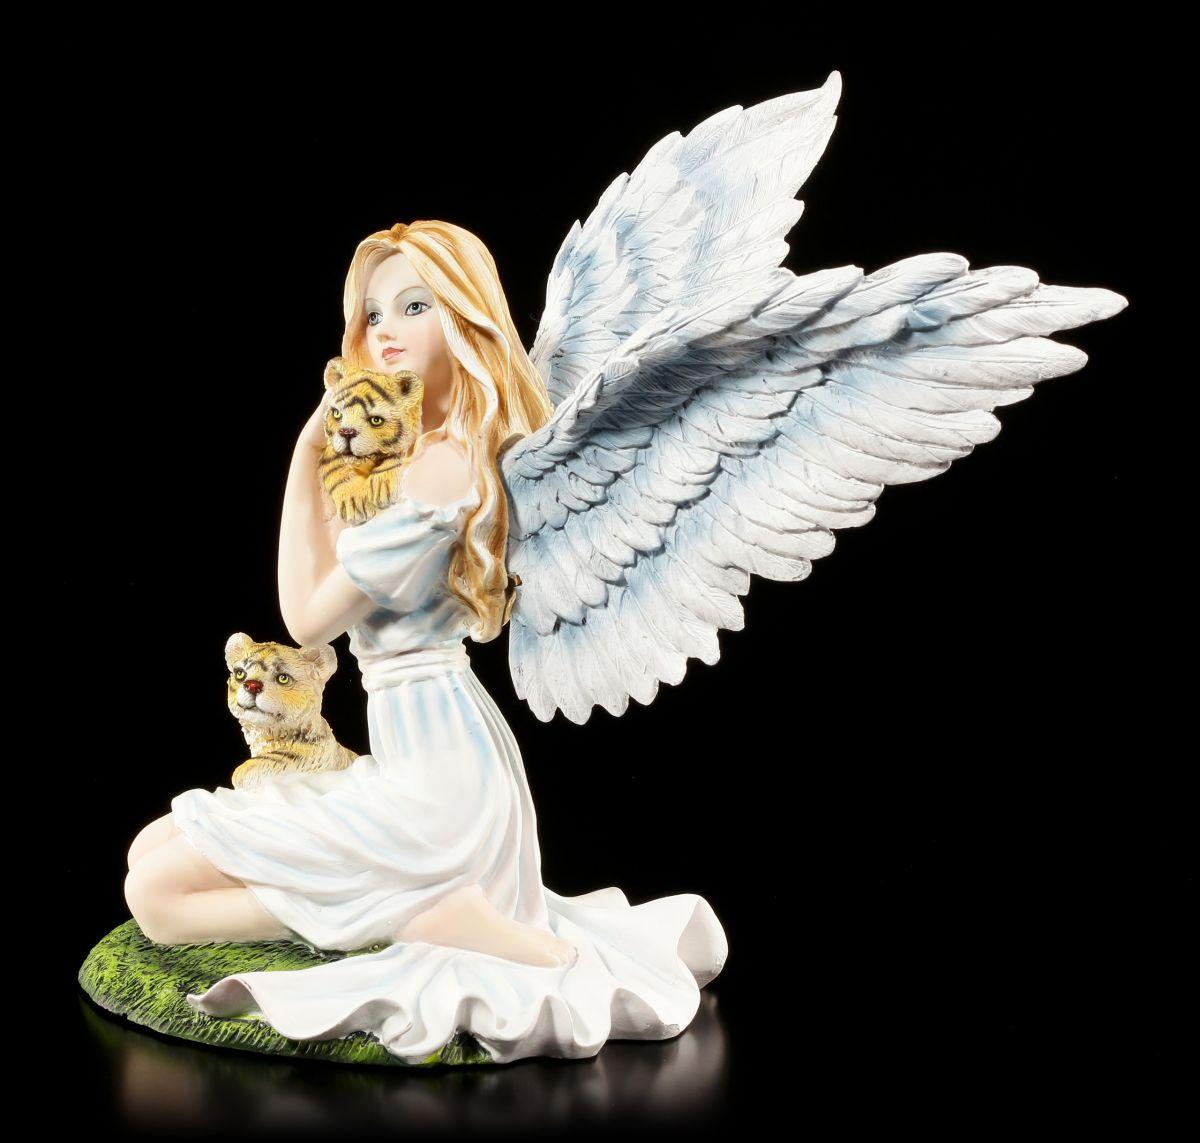 Süße Engel Figur mit Tiger-Babys - Fantasy Fee Elfe Statue